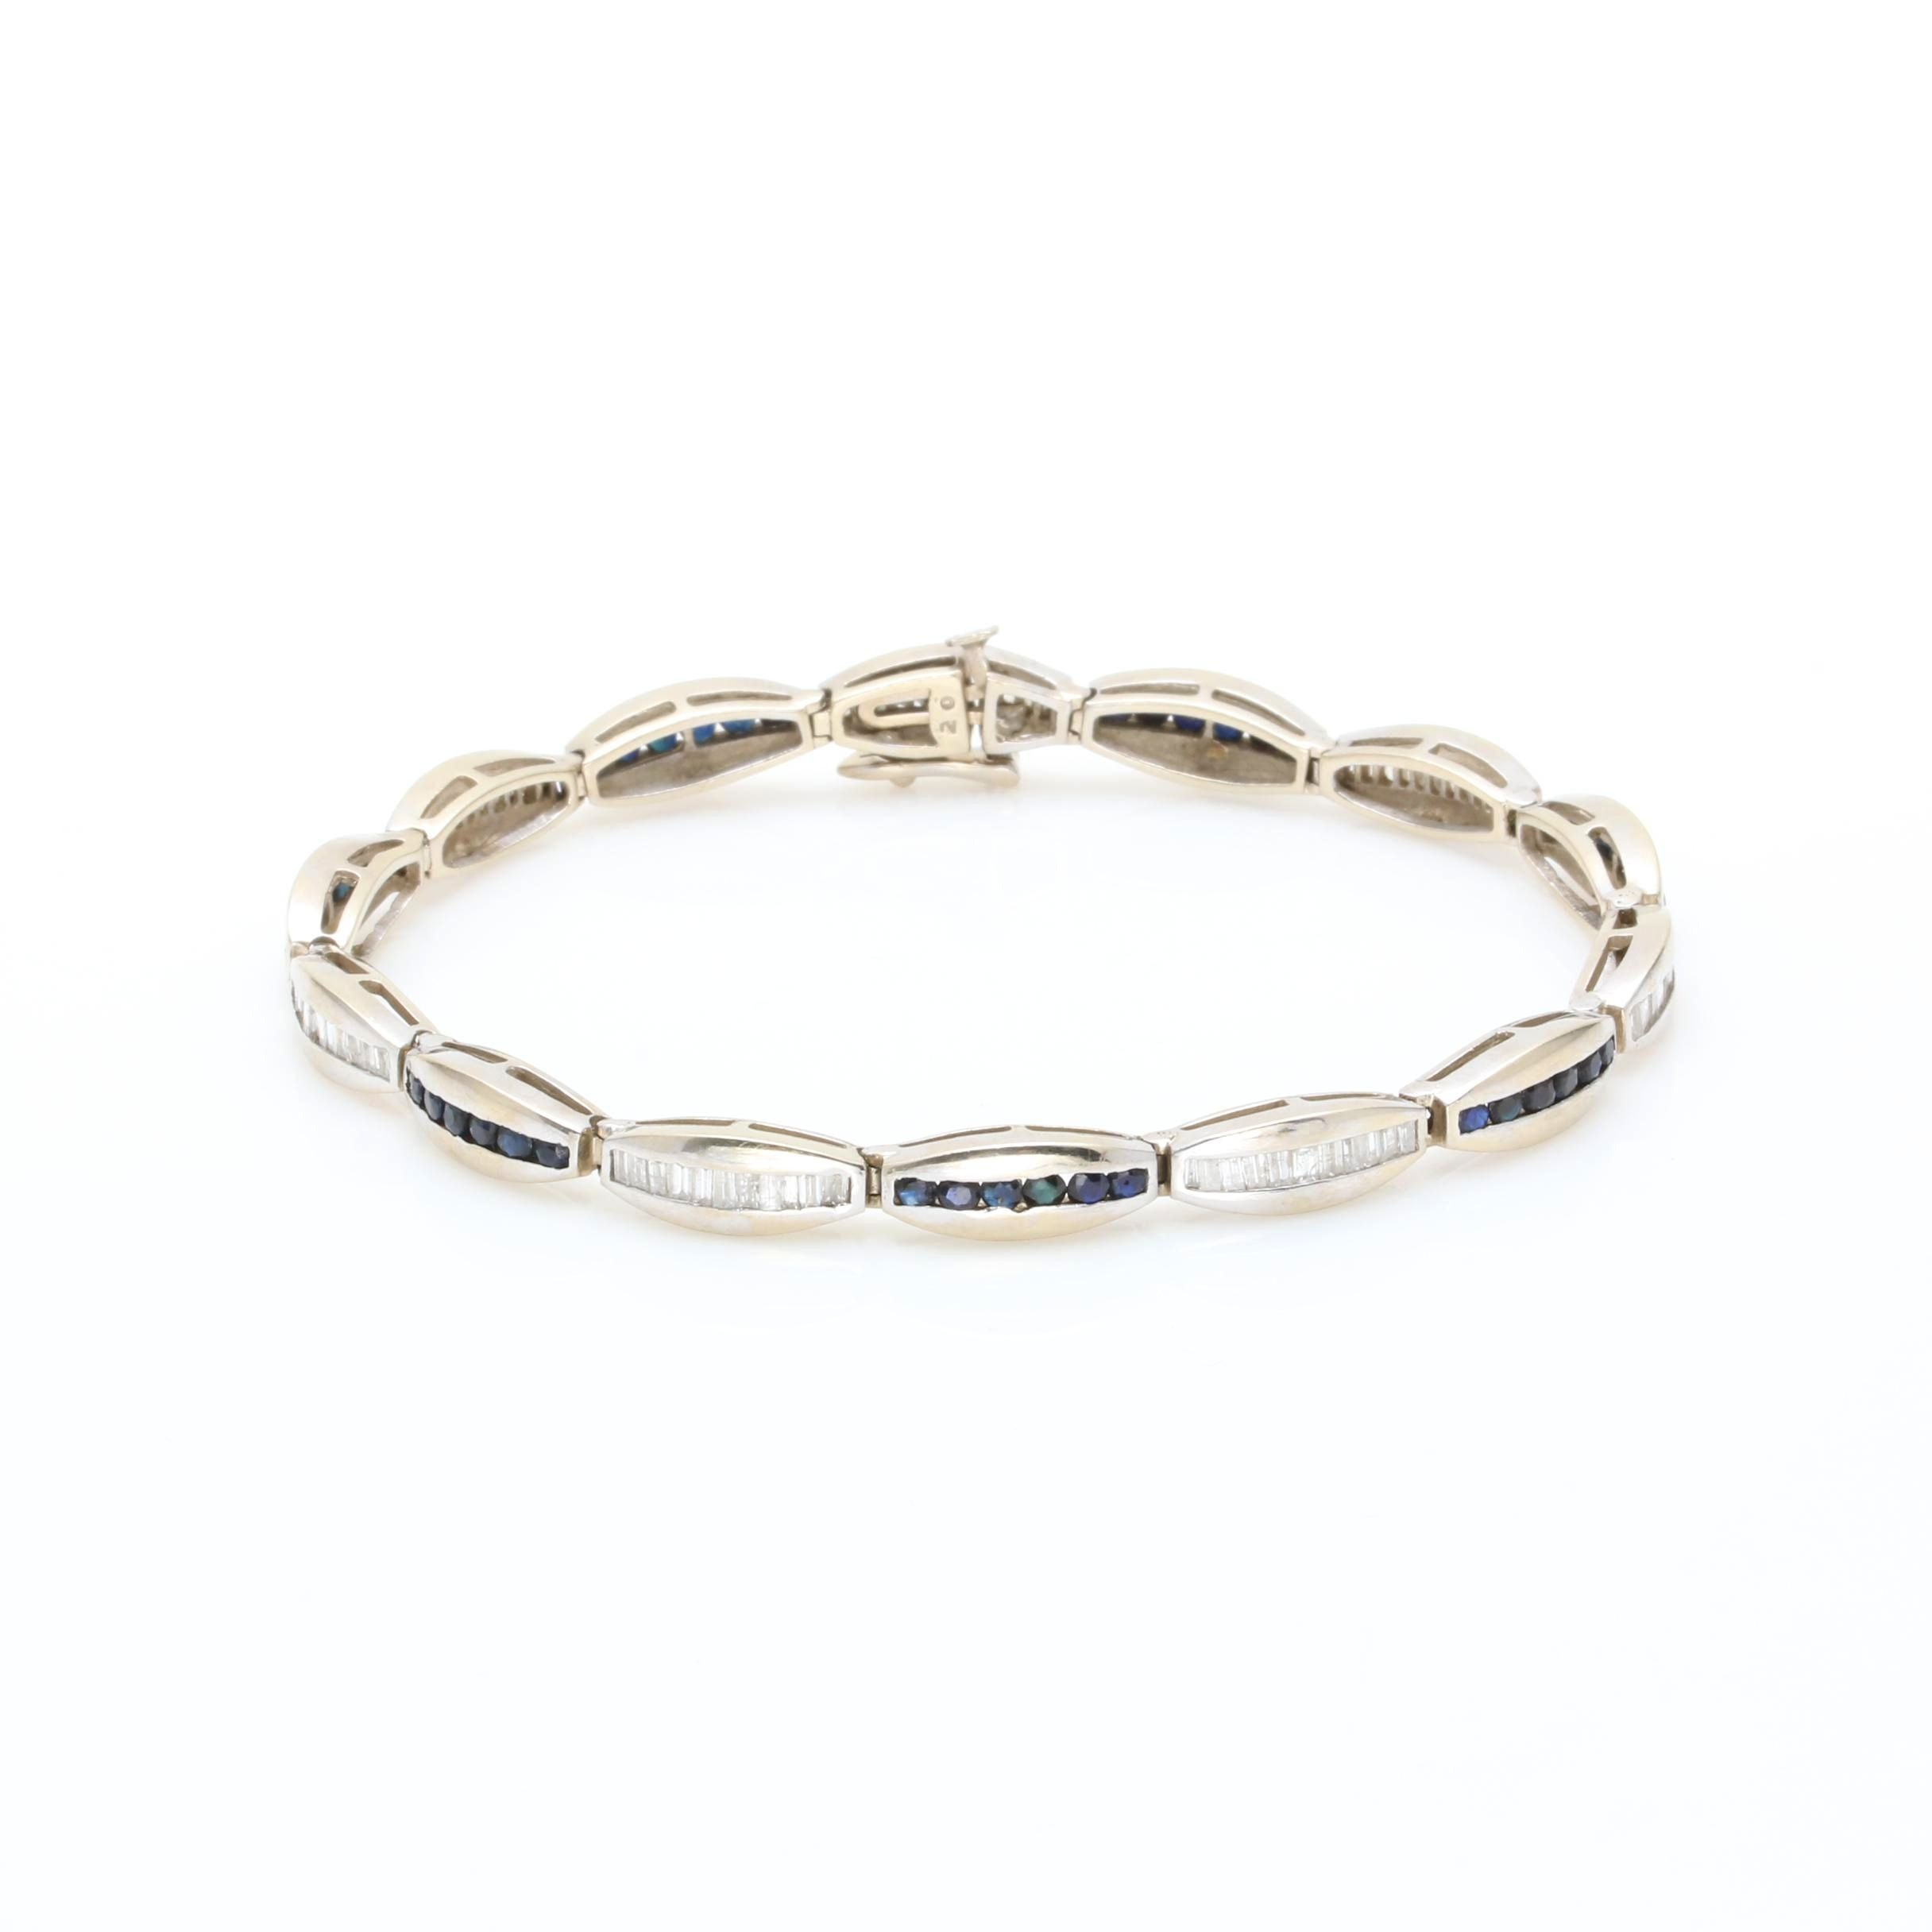 14K White Gold Diamond and Blue Sapphire Tennis Bracelet